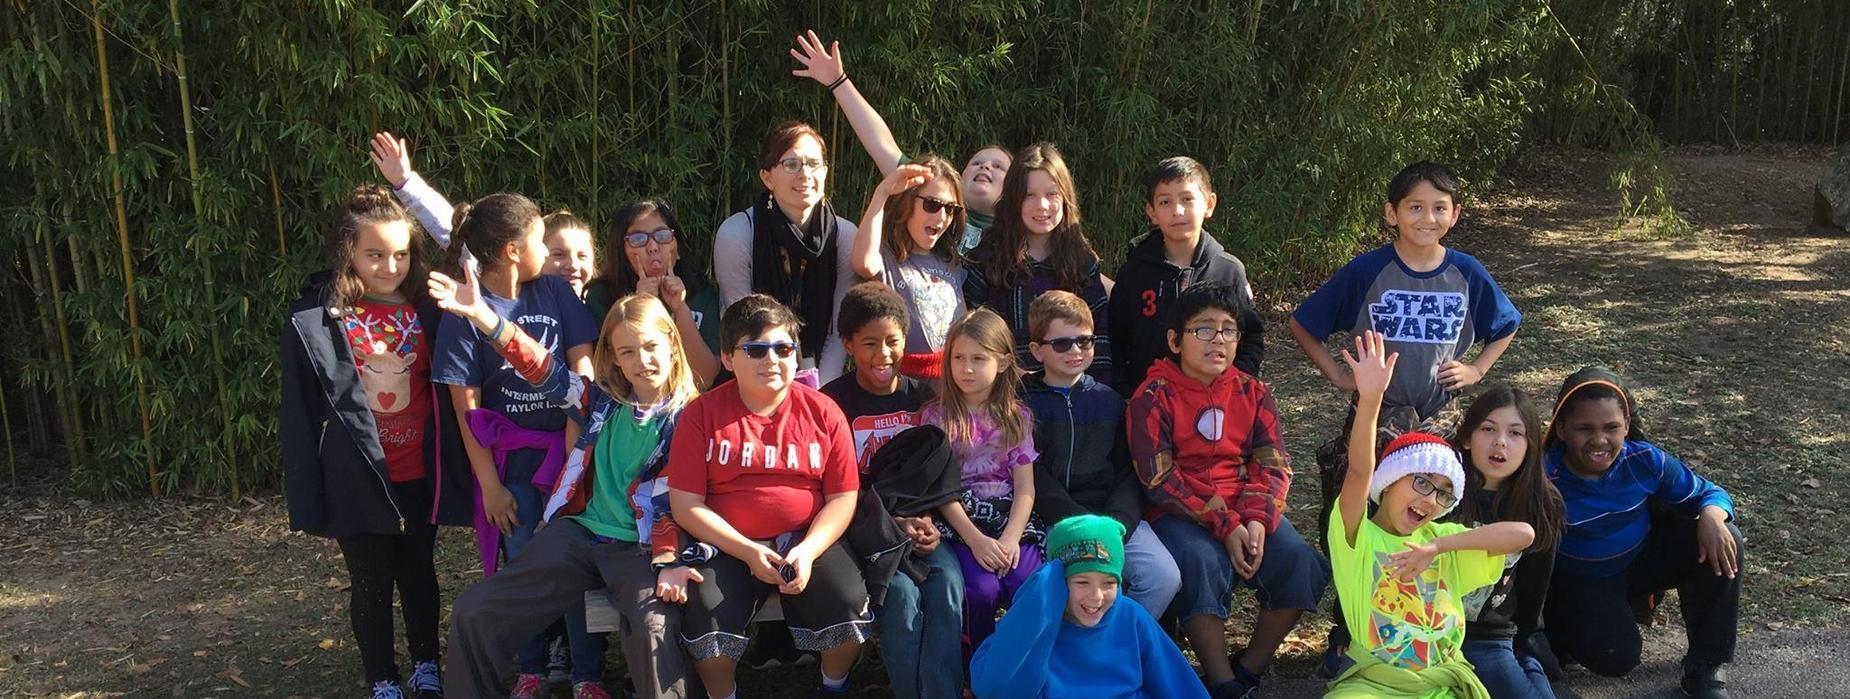 4th graders at the zoo